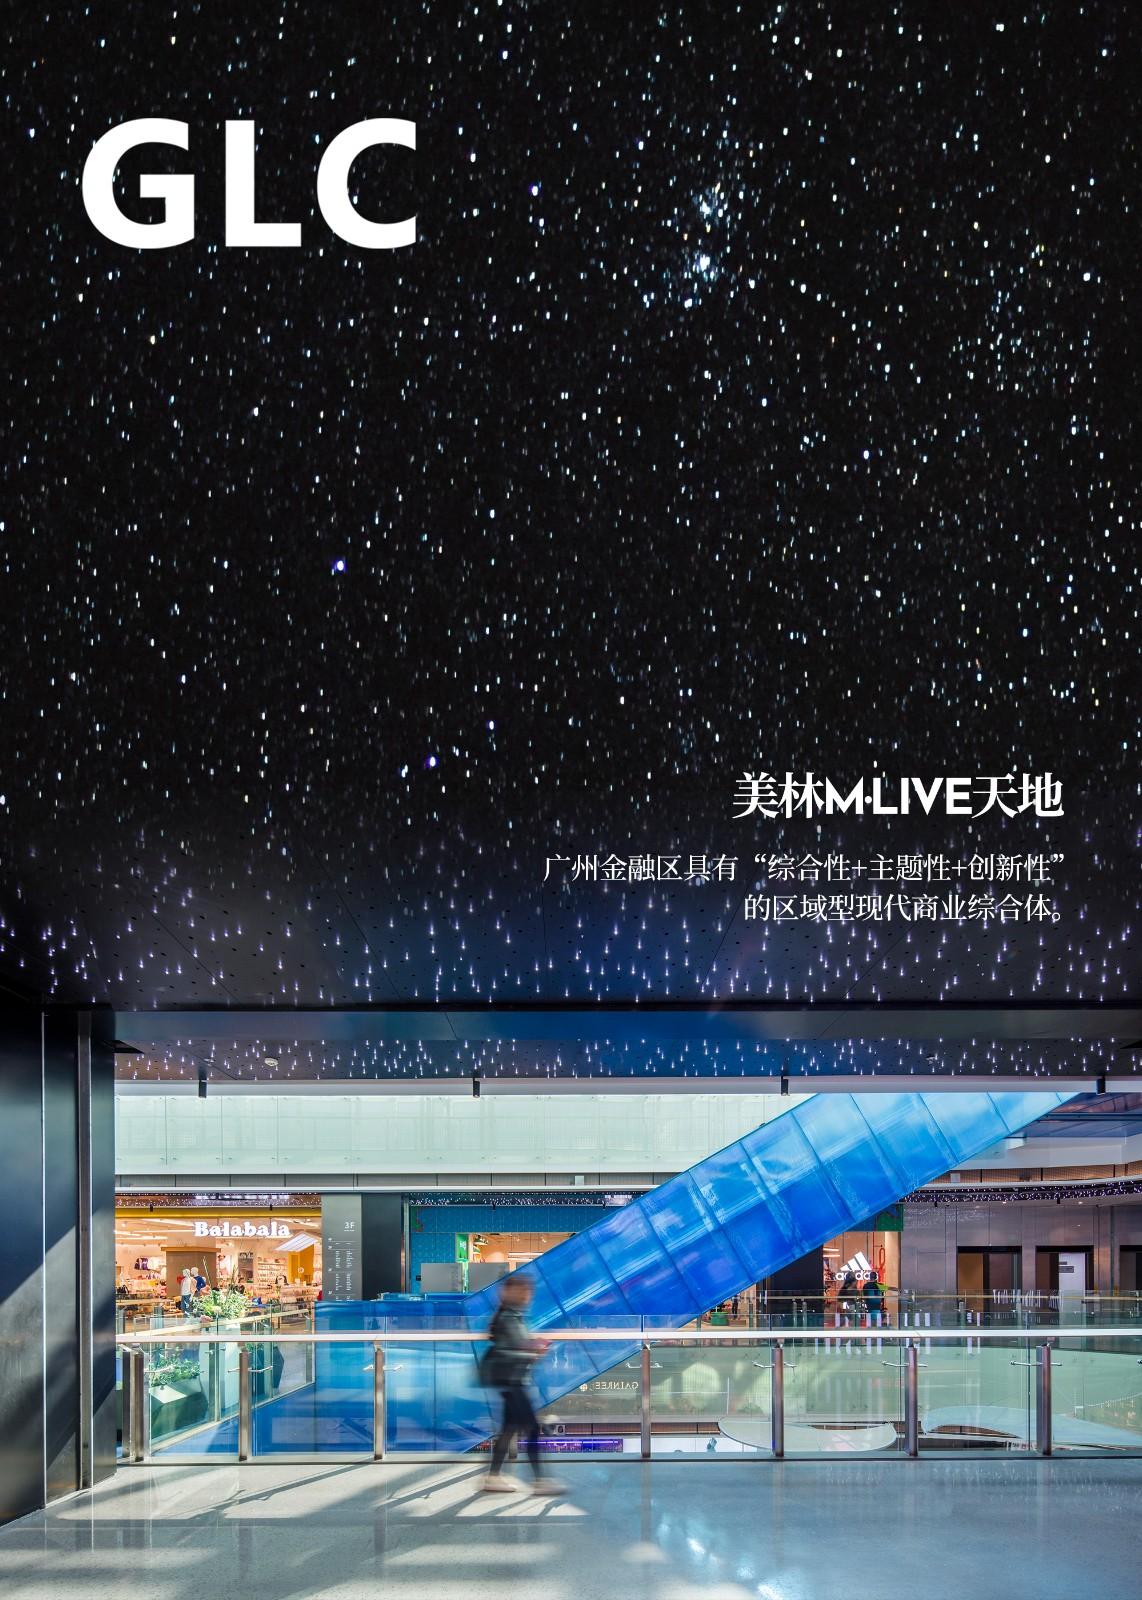 GLC   美林M·LIVE天地:综合体改造,商业与生活愉悦共生